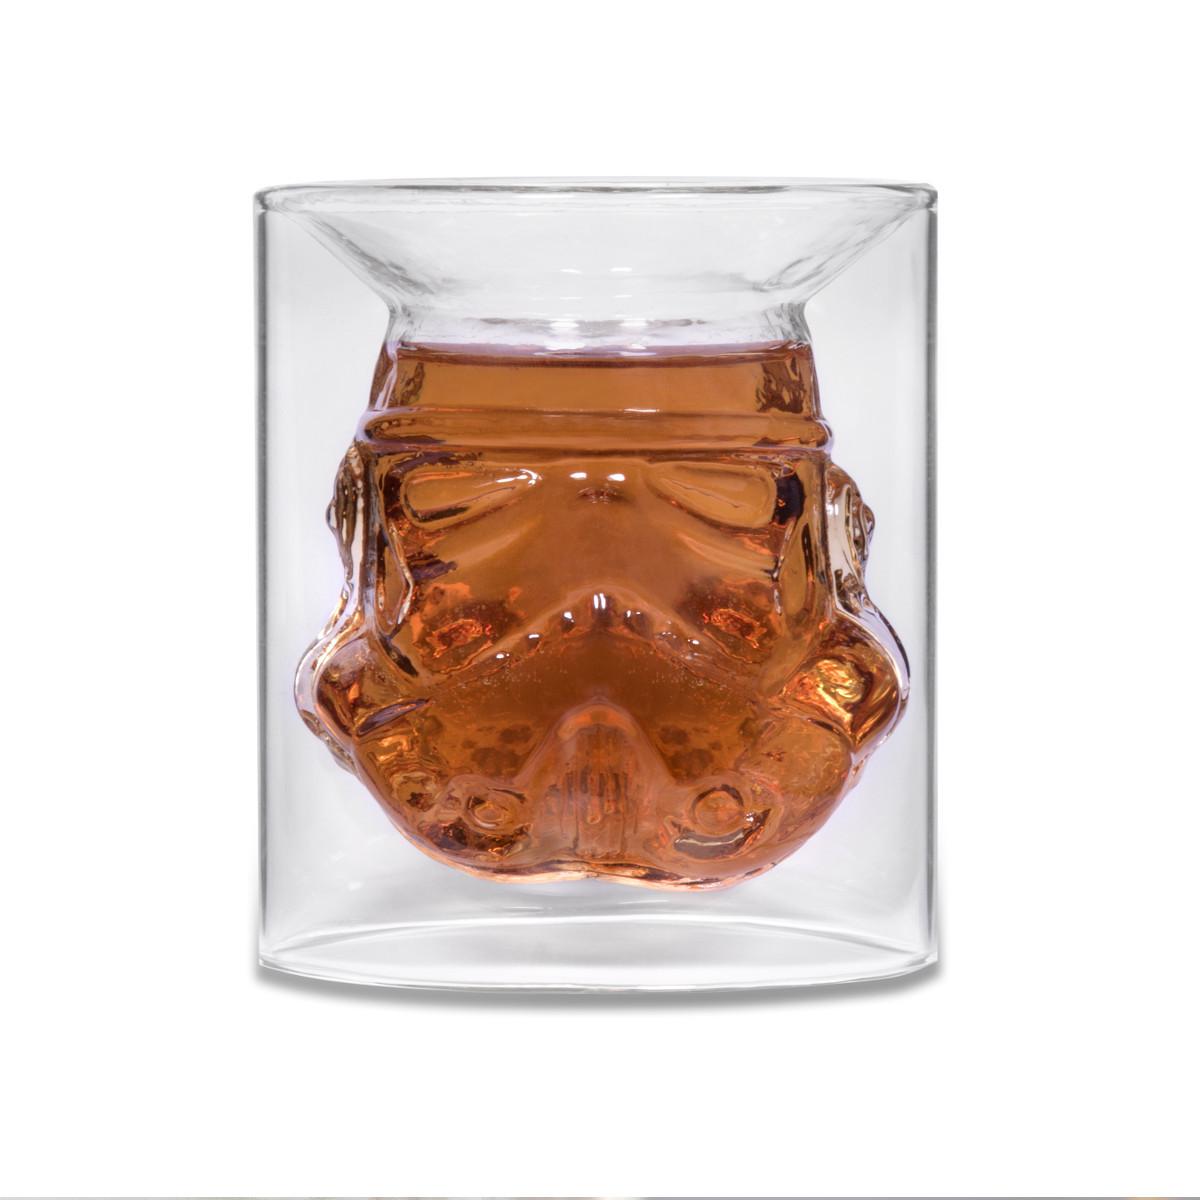 STAR WARS STORMTROOPER GLASS